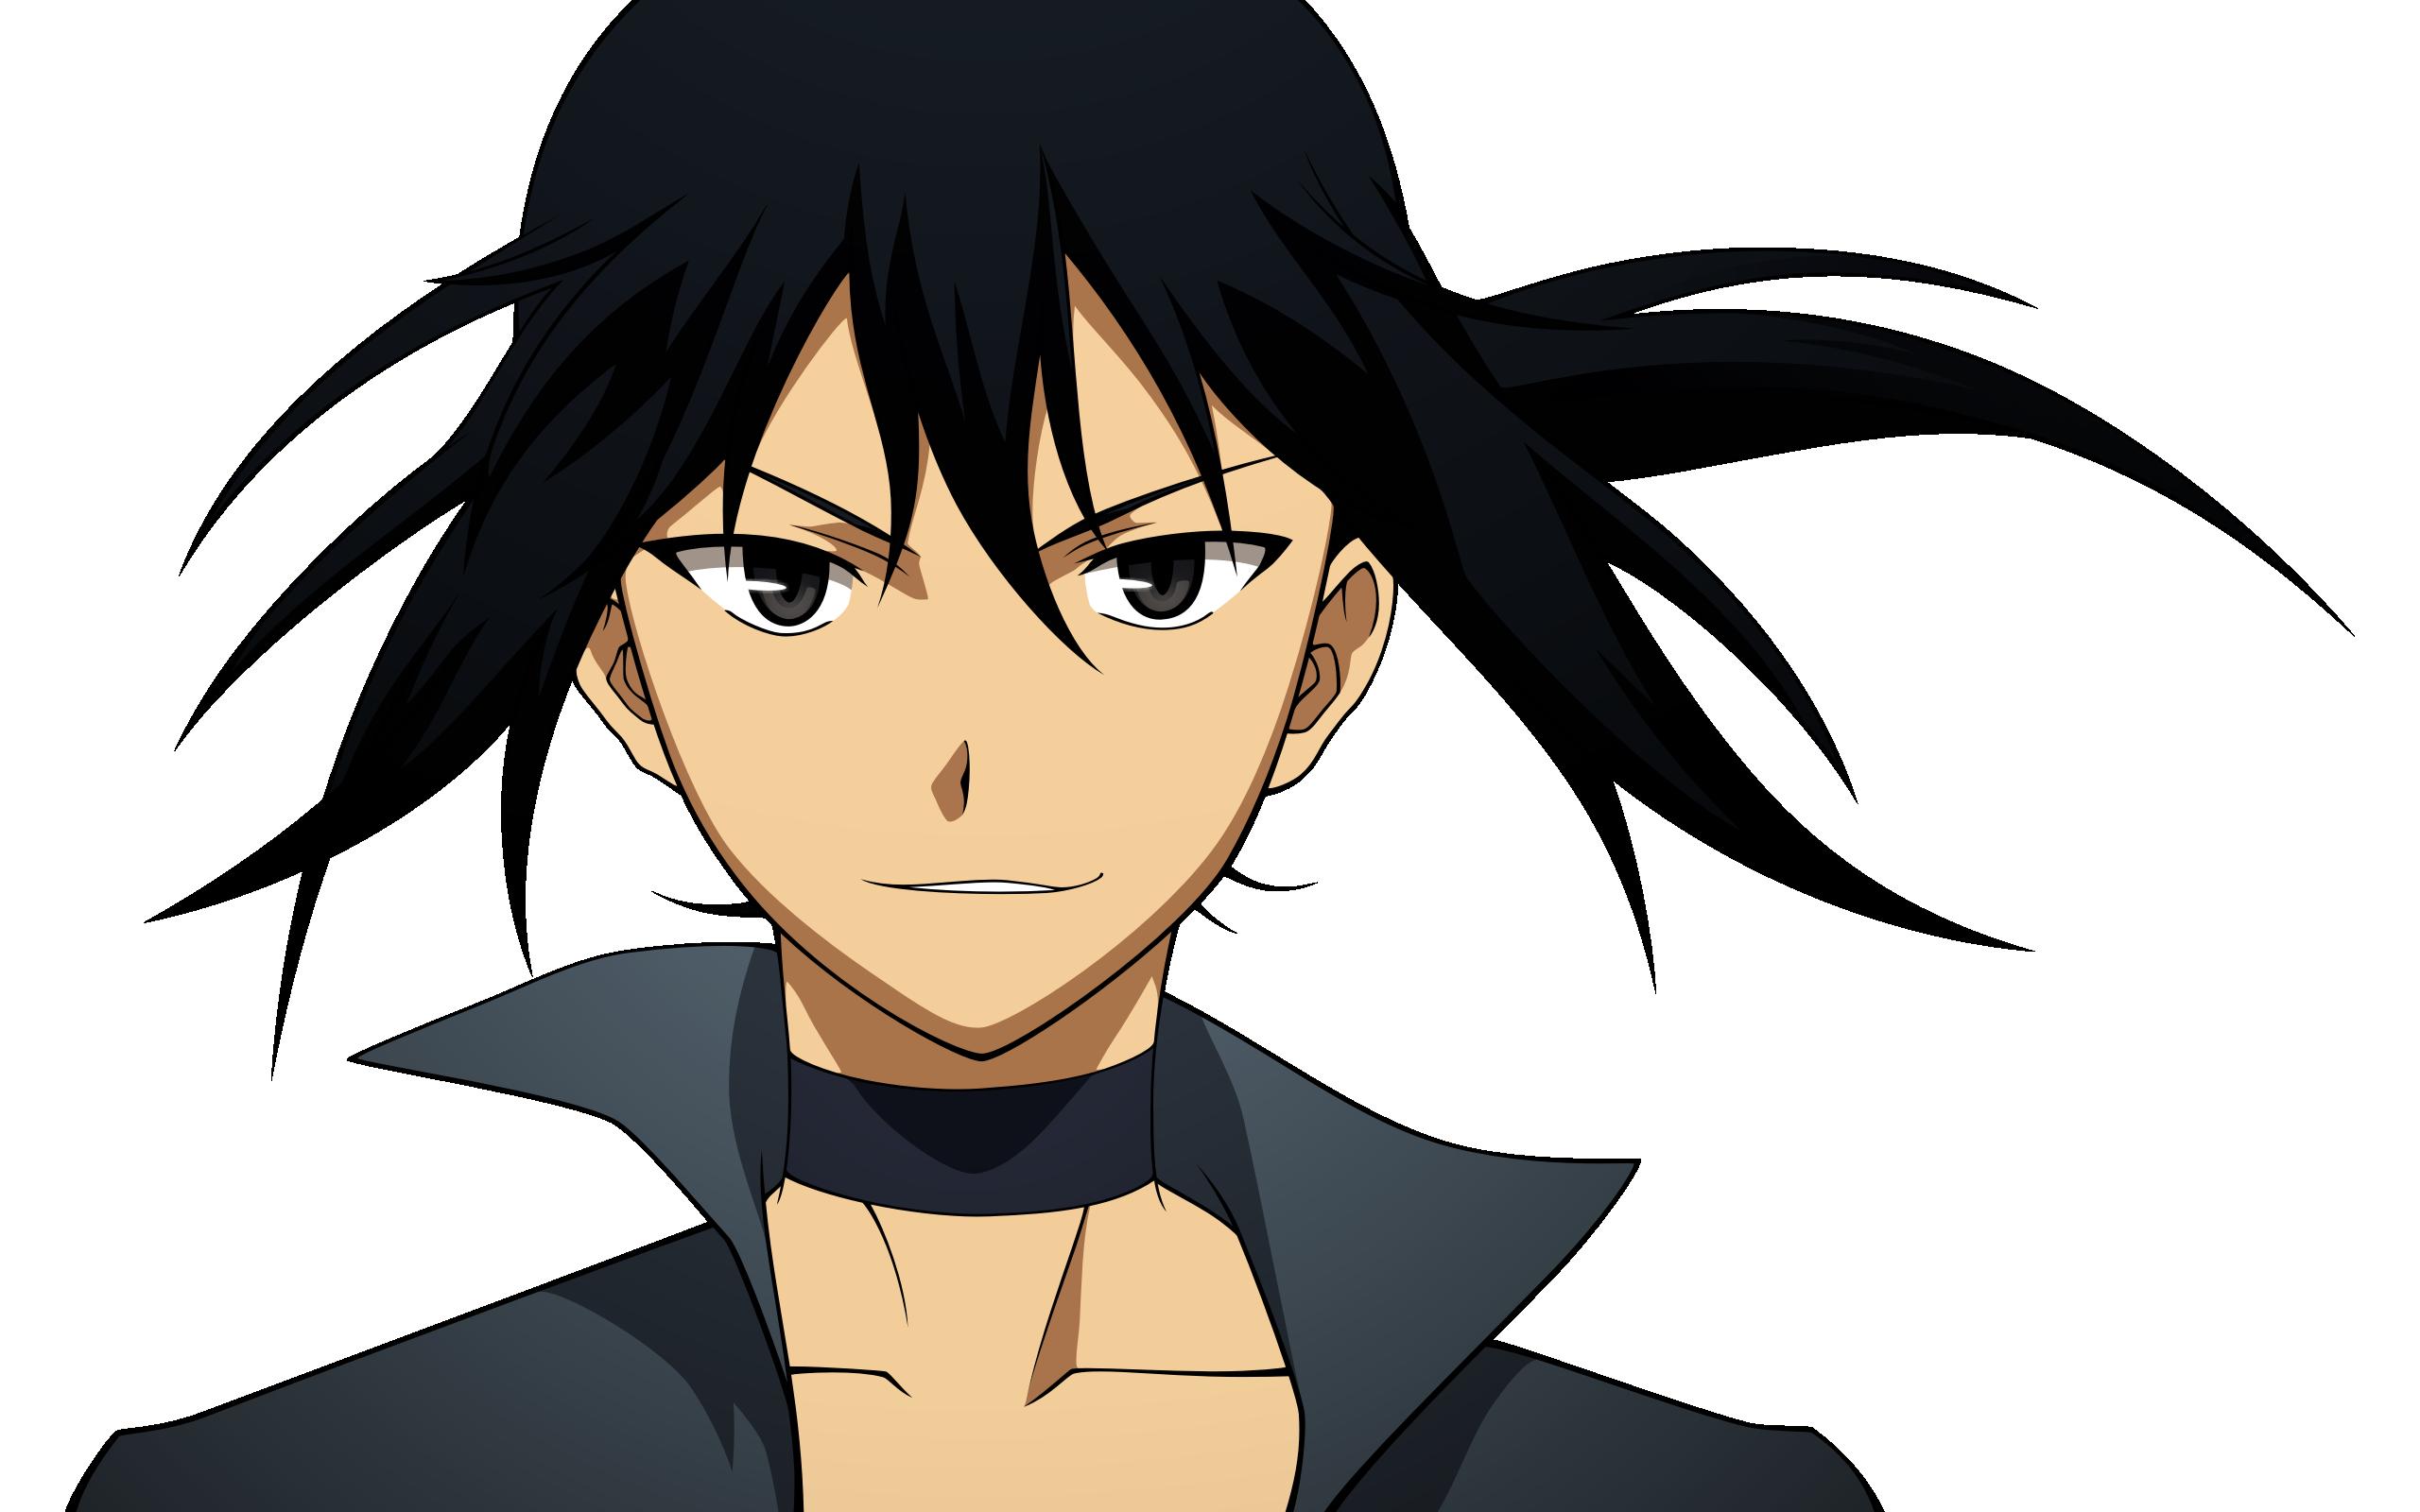 Canaan Anime Canaan anime, Anime shows, Anime